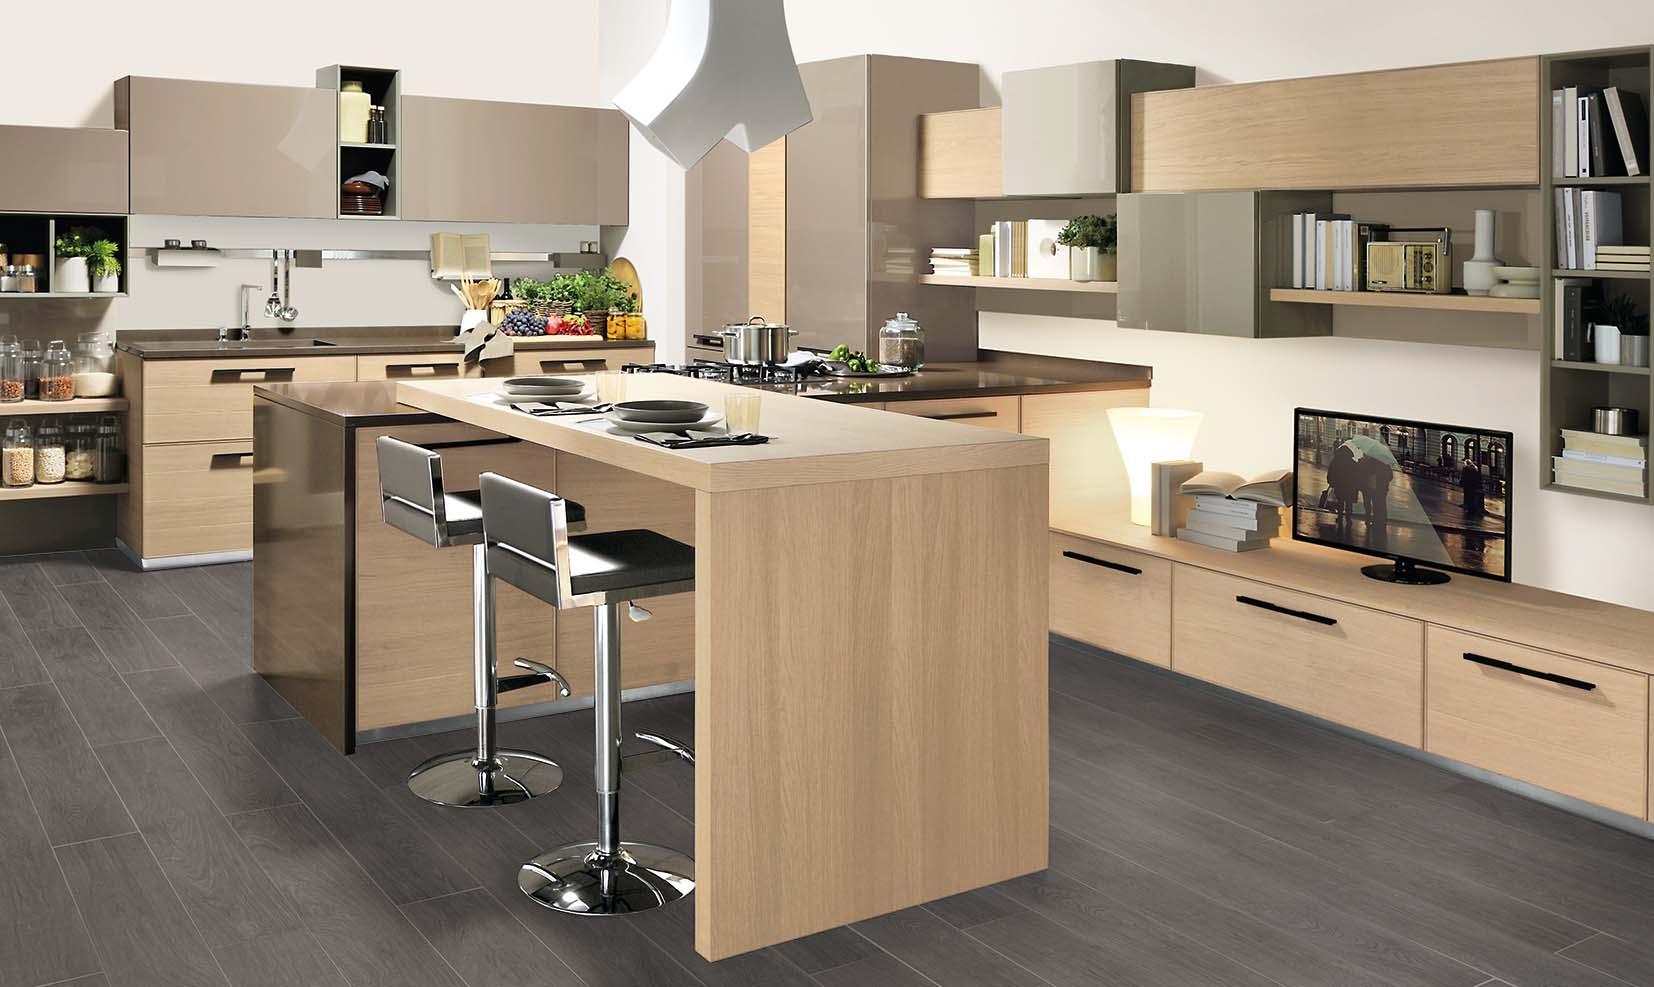 Le cucine ad isola moderne e multifunzionali - Cucine in linea moderne ...